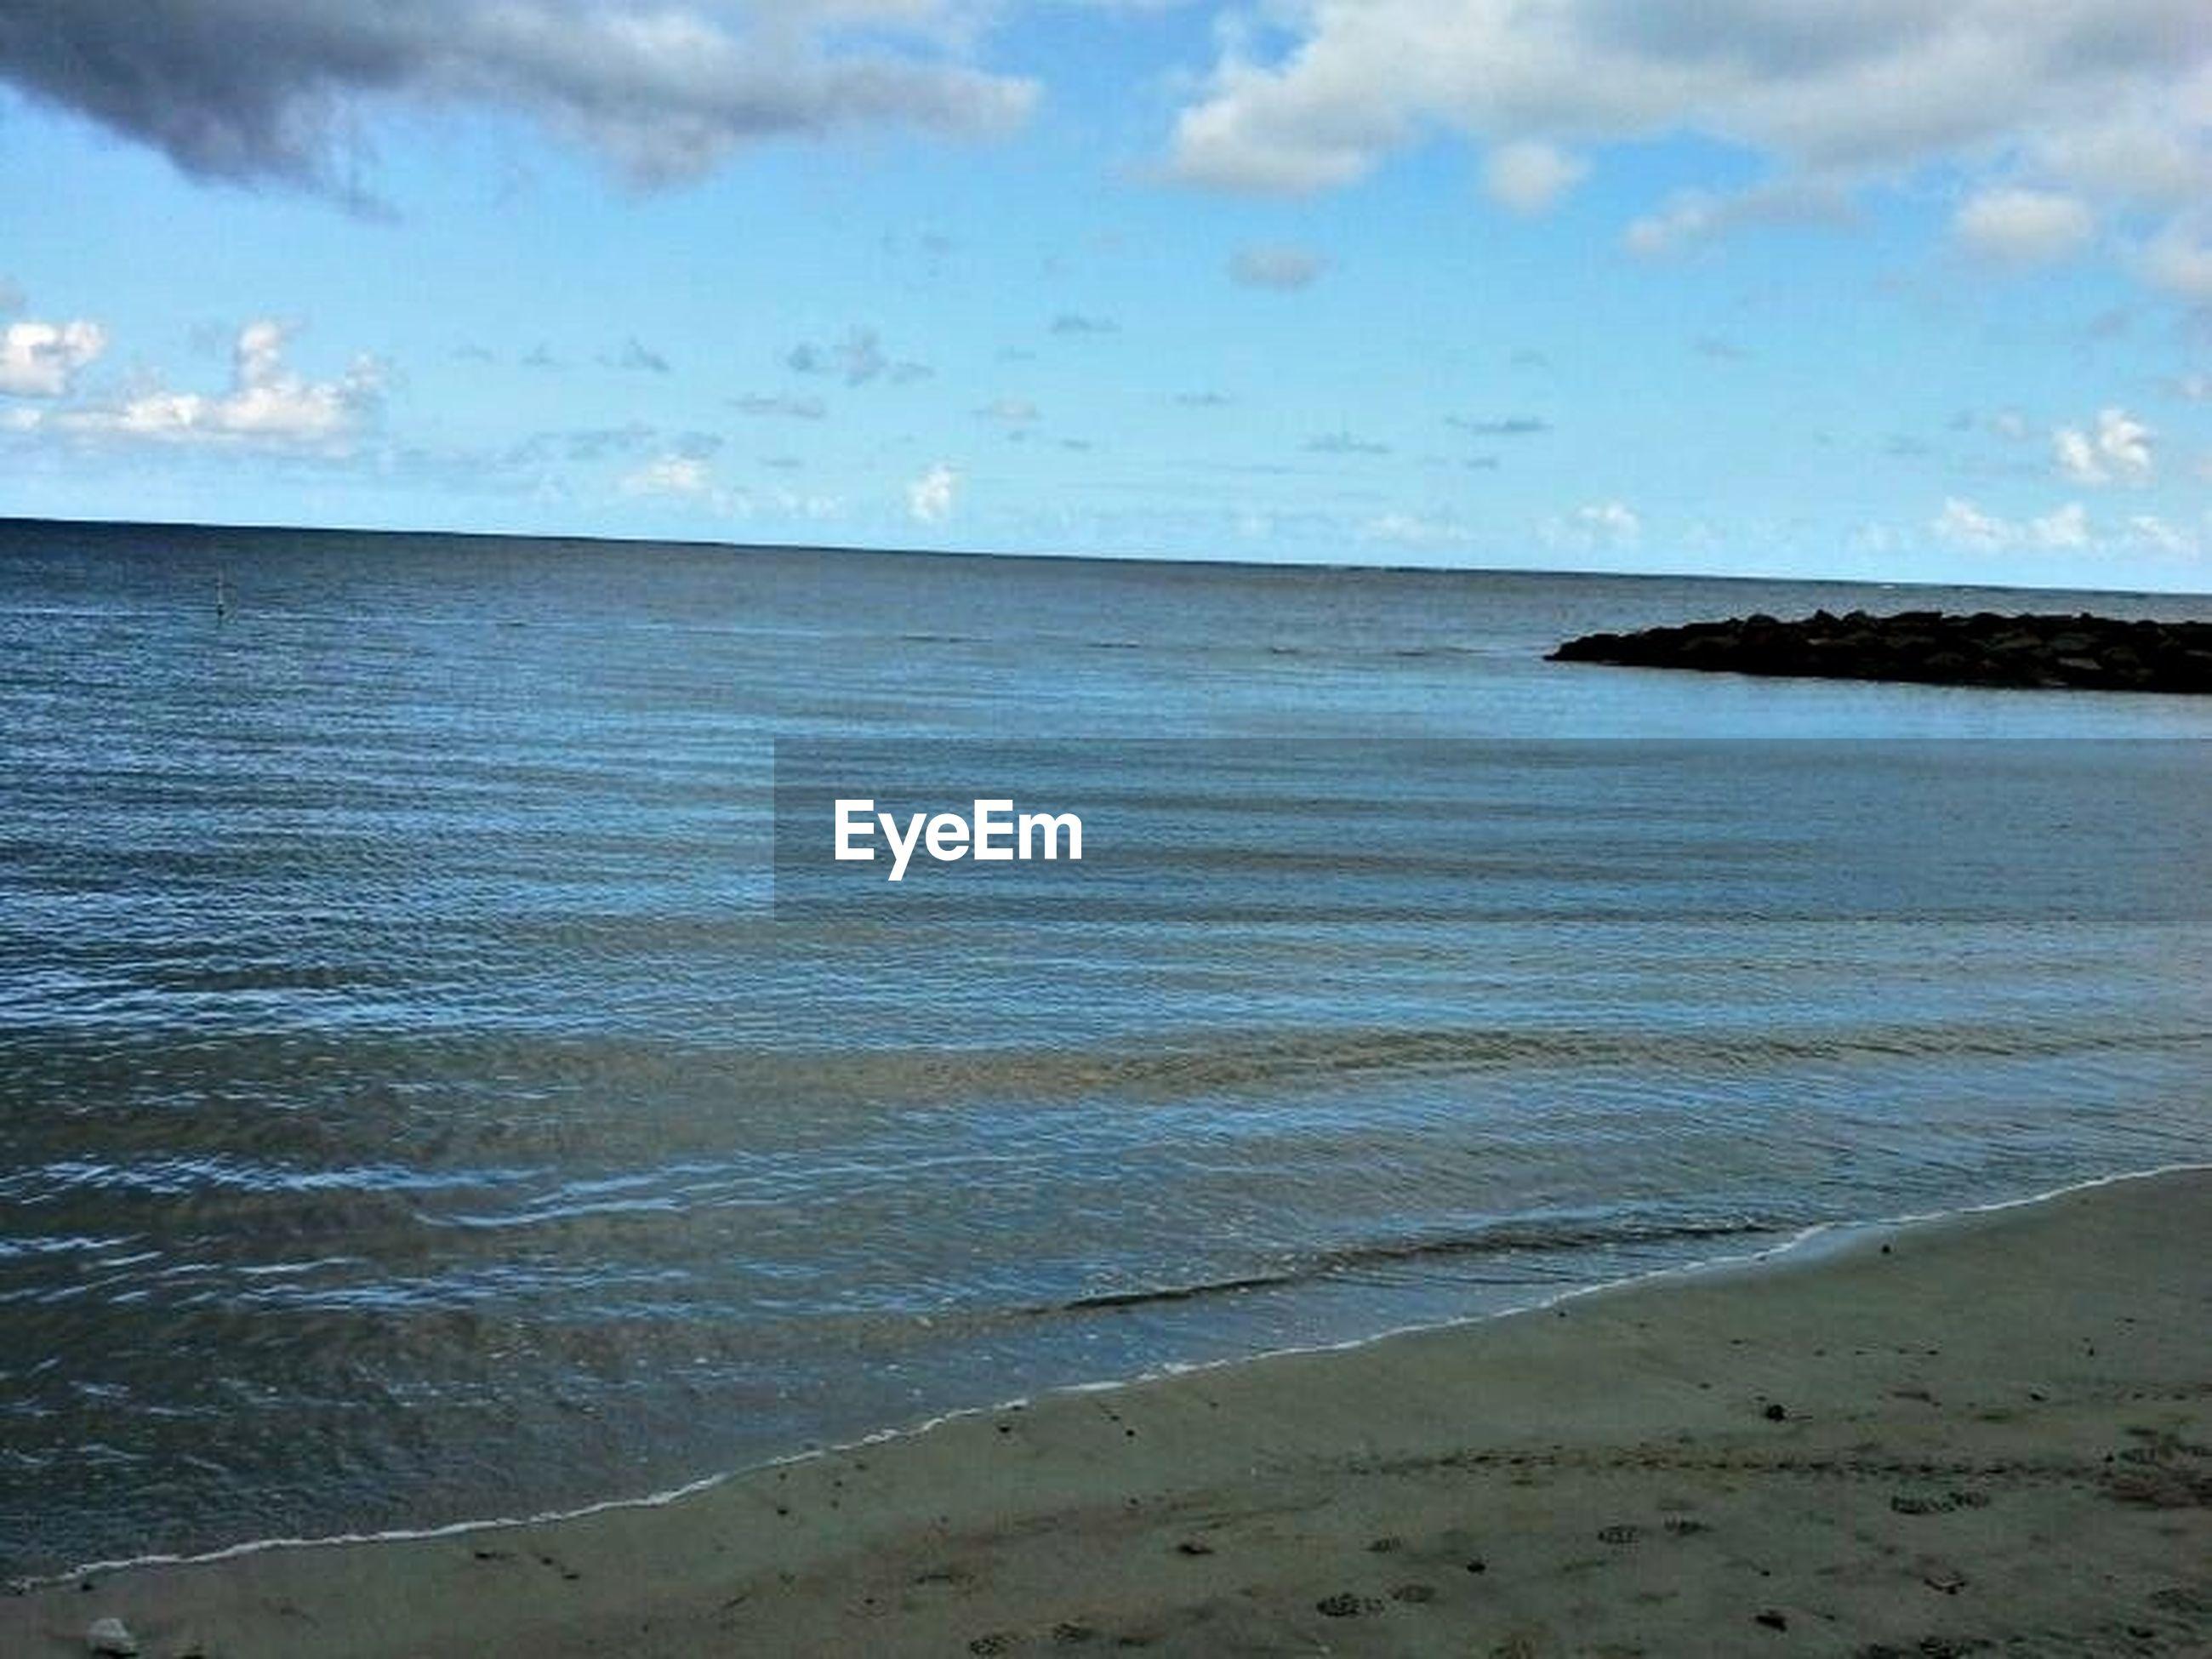 sea, water, horizon over water, beach, sky, tranquil scene, tranquility, scenics, shore, beauty in nature, sand, nature, cloud, cloud - sky, idyllic, coastline, calm, blue, seascape, remote